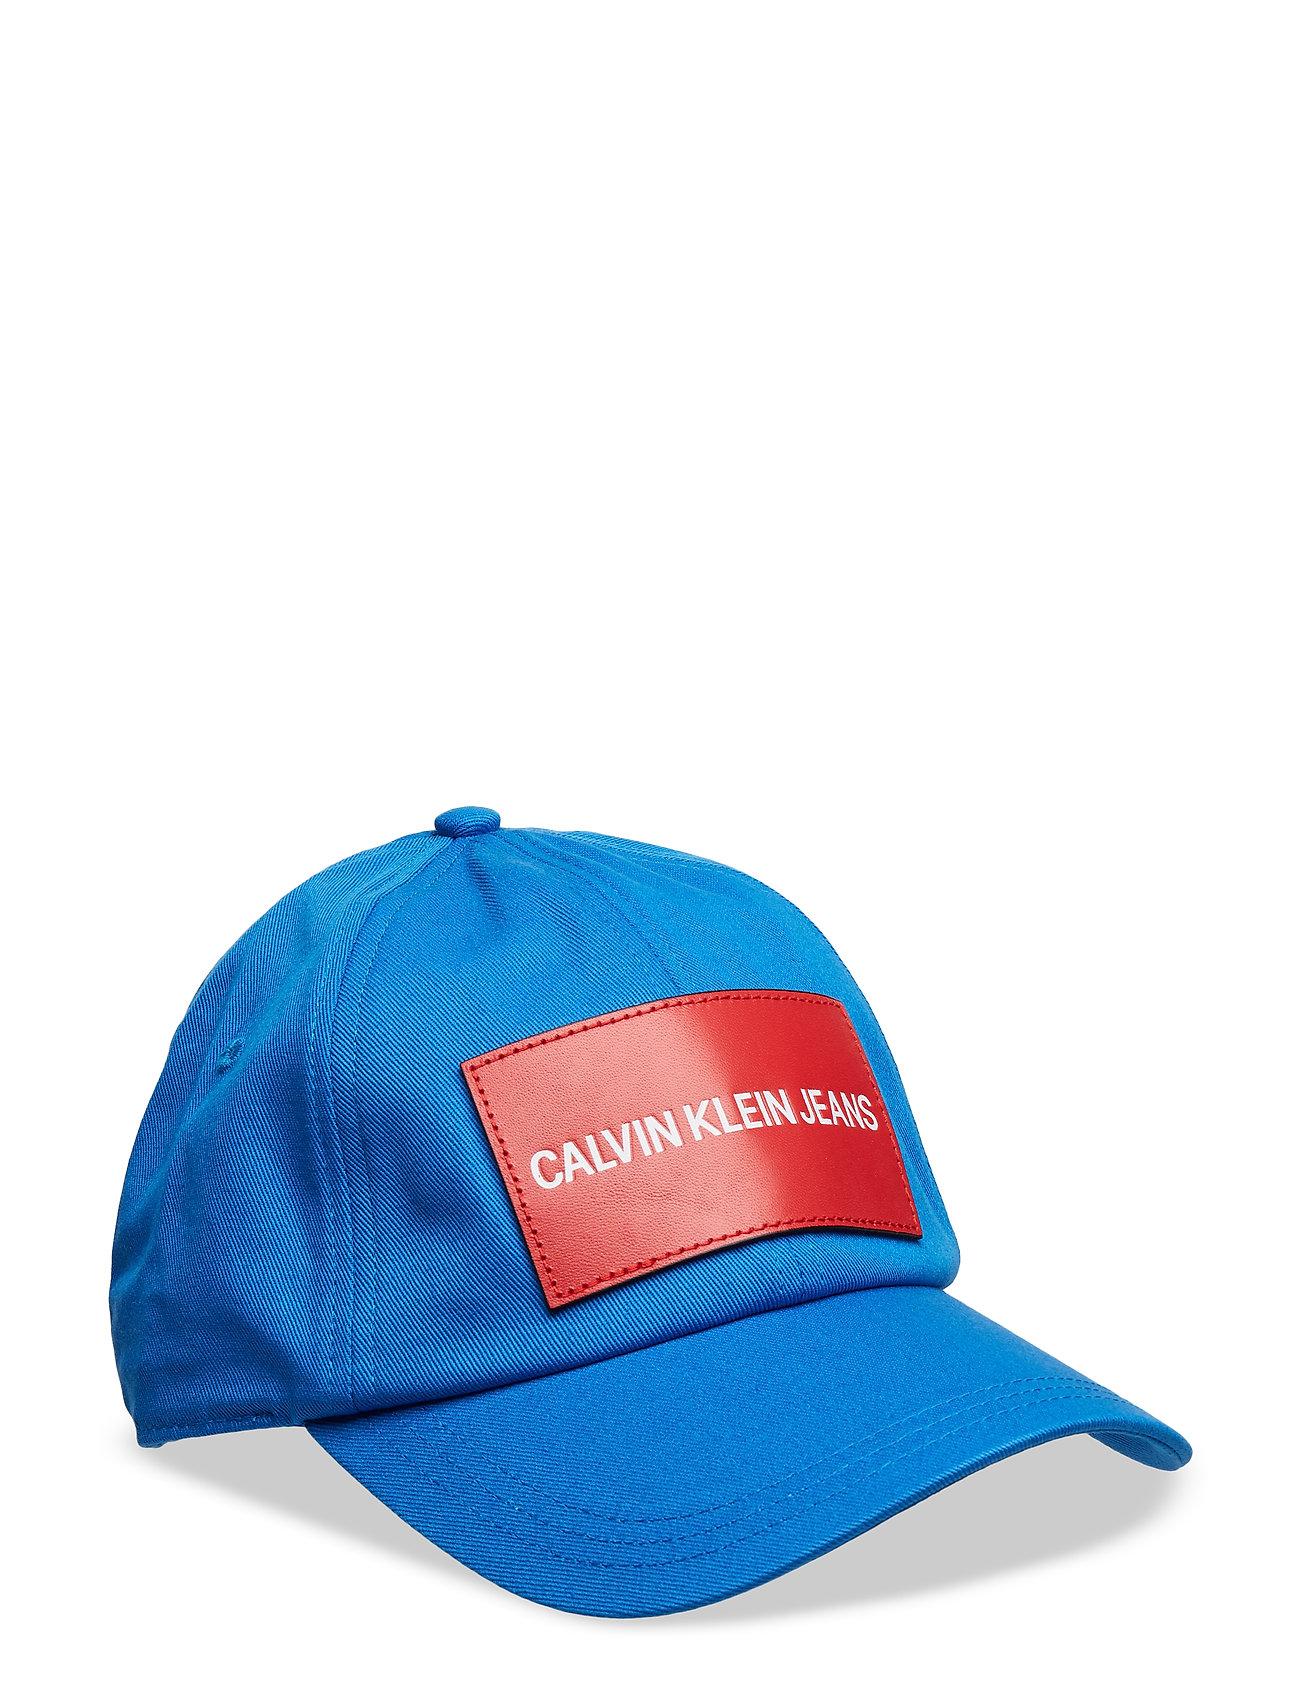 Image of J Calvin Klein Jeans Accessories Headwear Caps Blå Calvin Klein (3094066311)